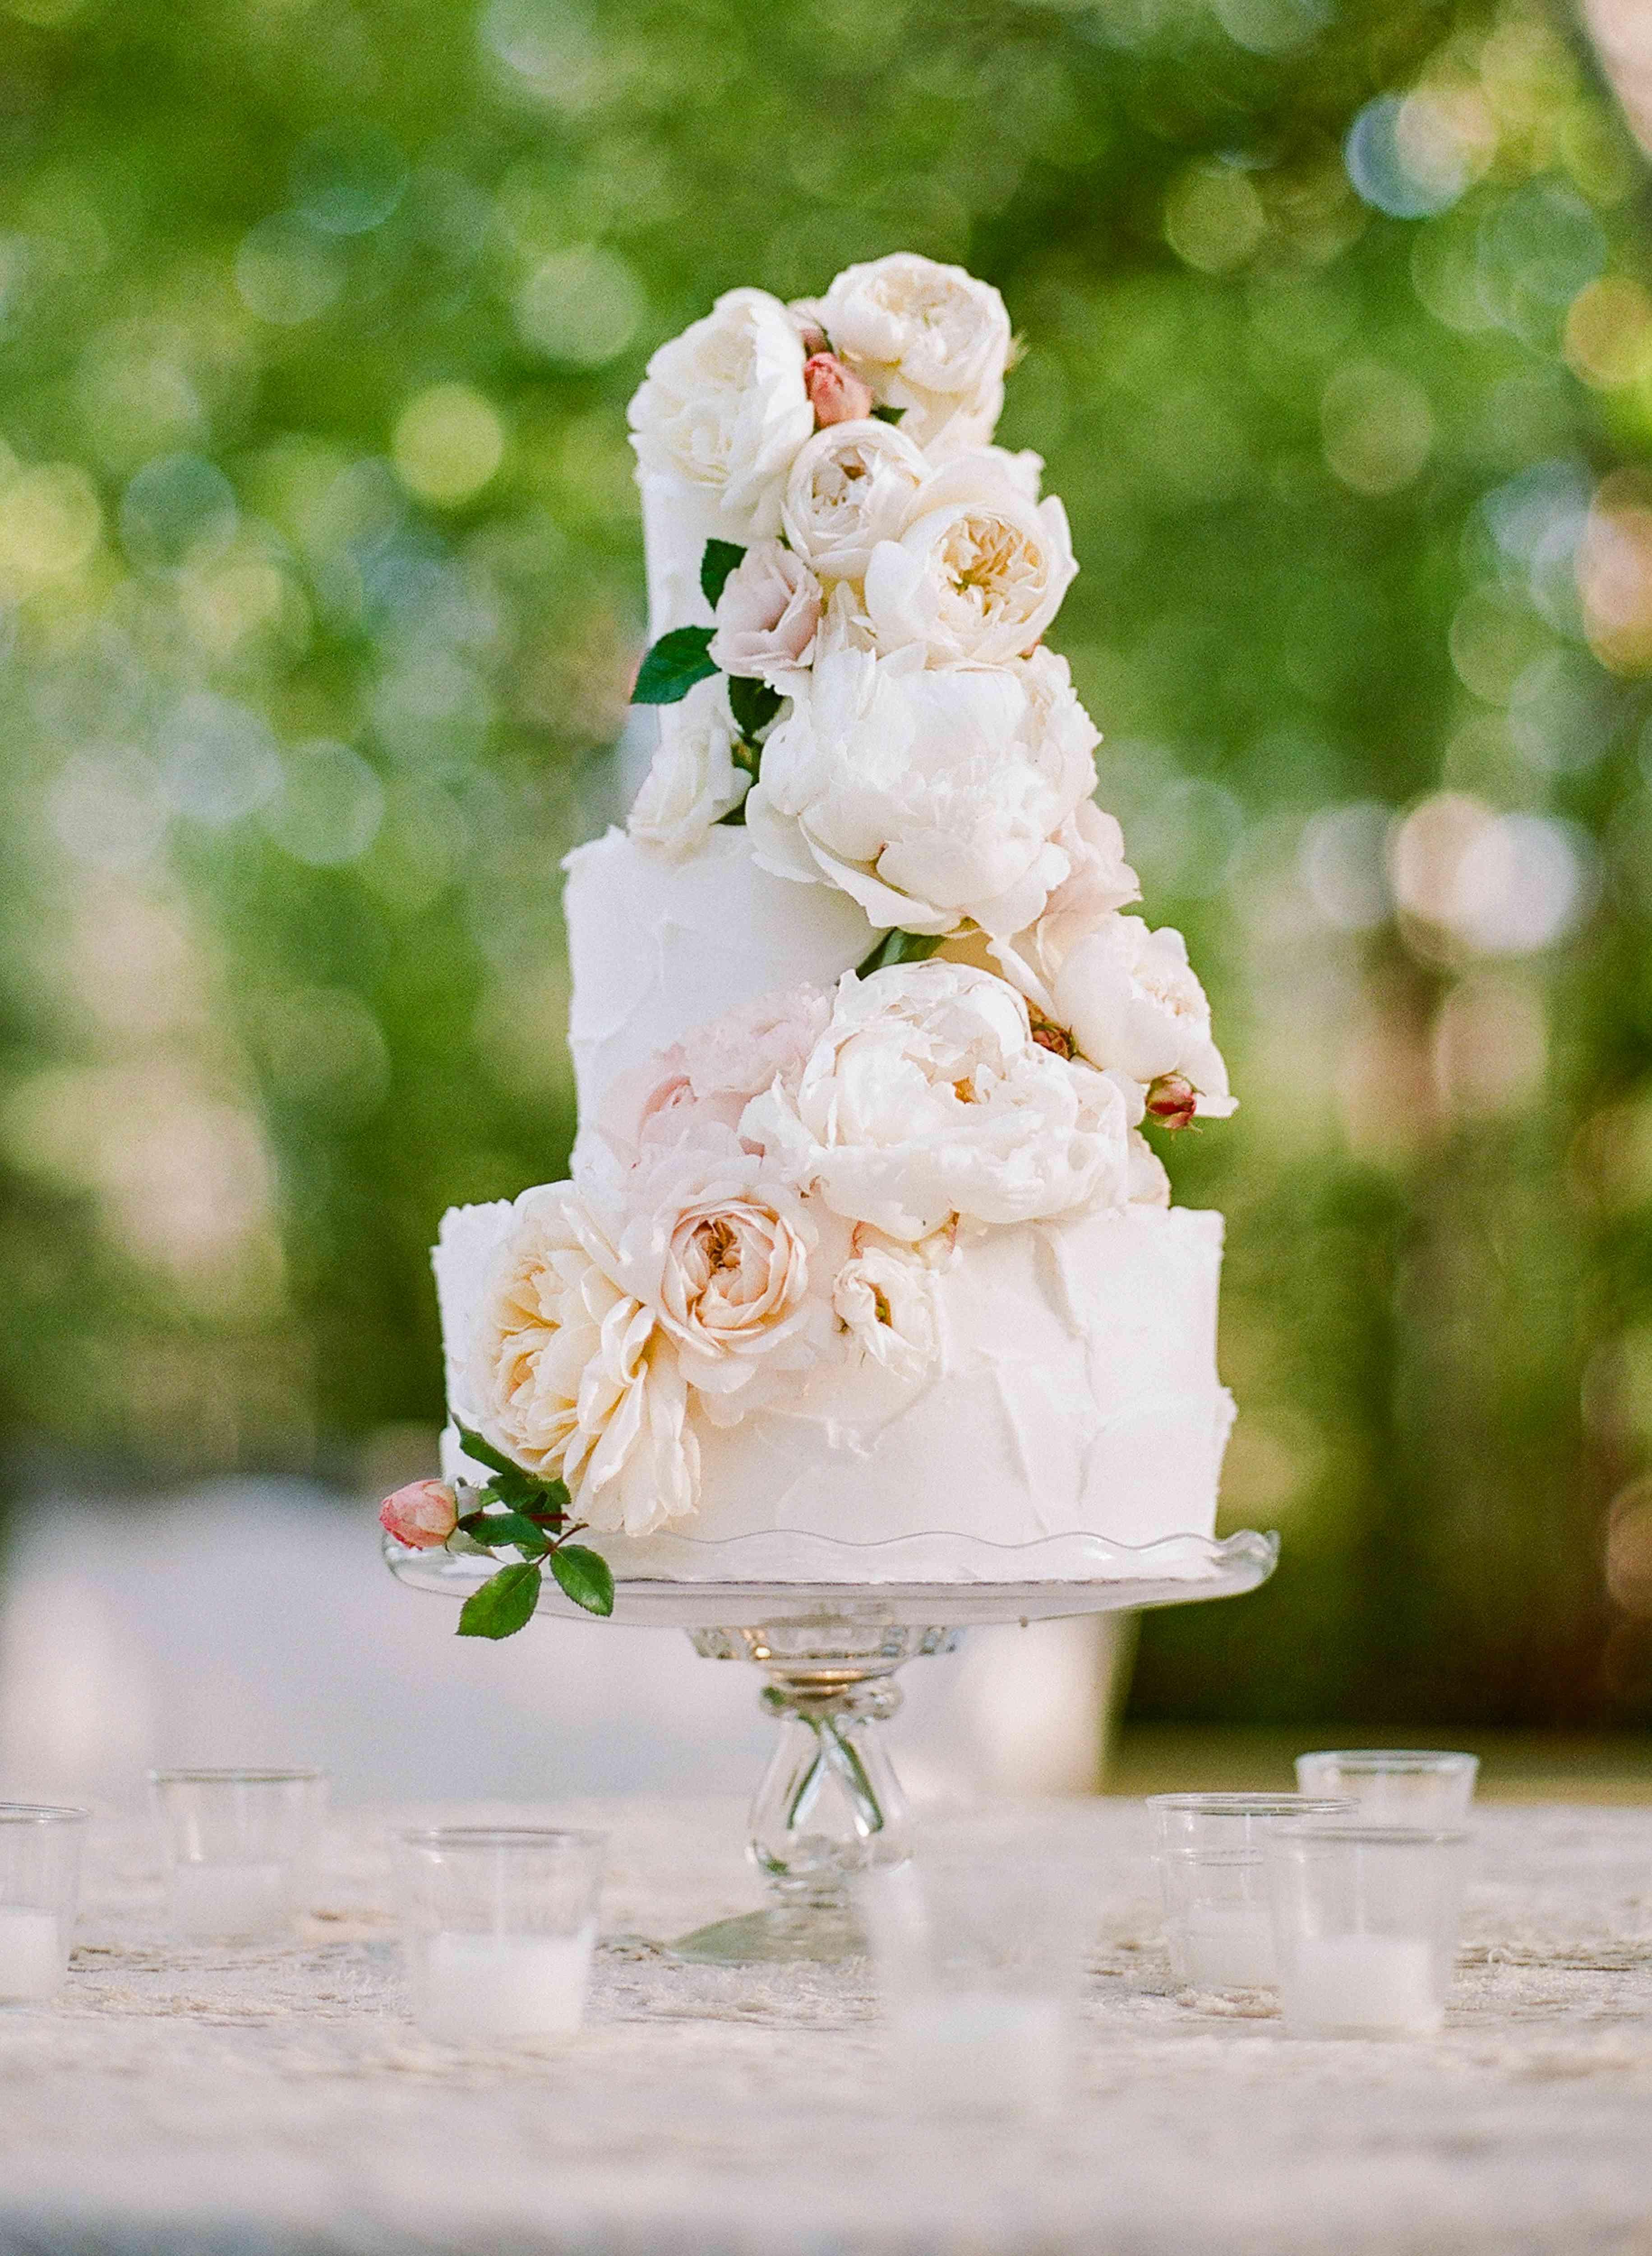 <p>wedding cake with fresh flowers</p>